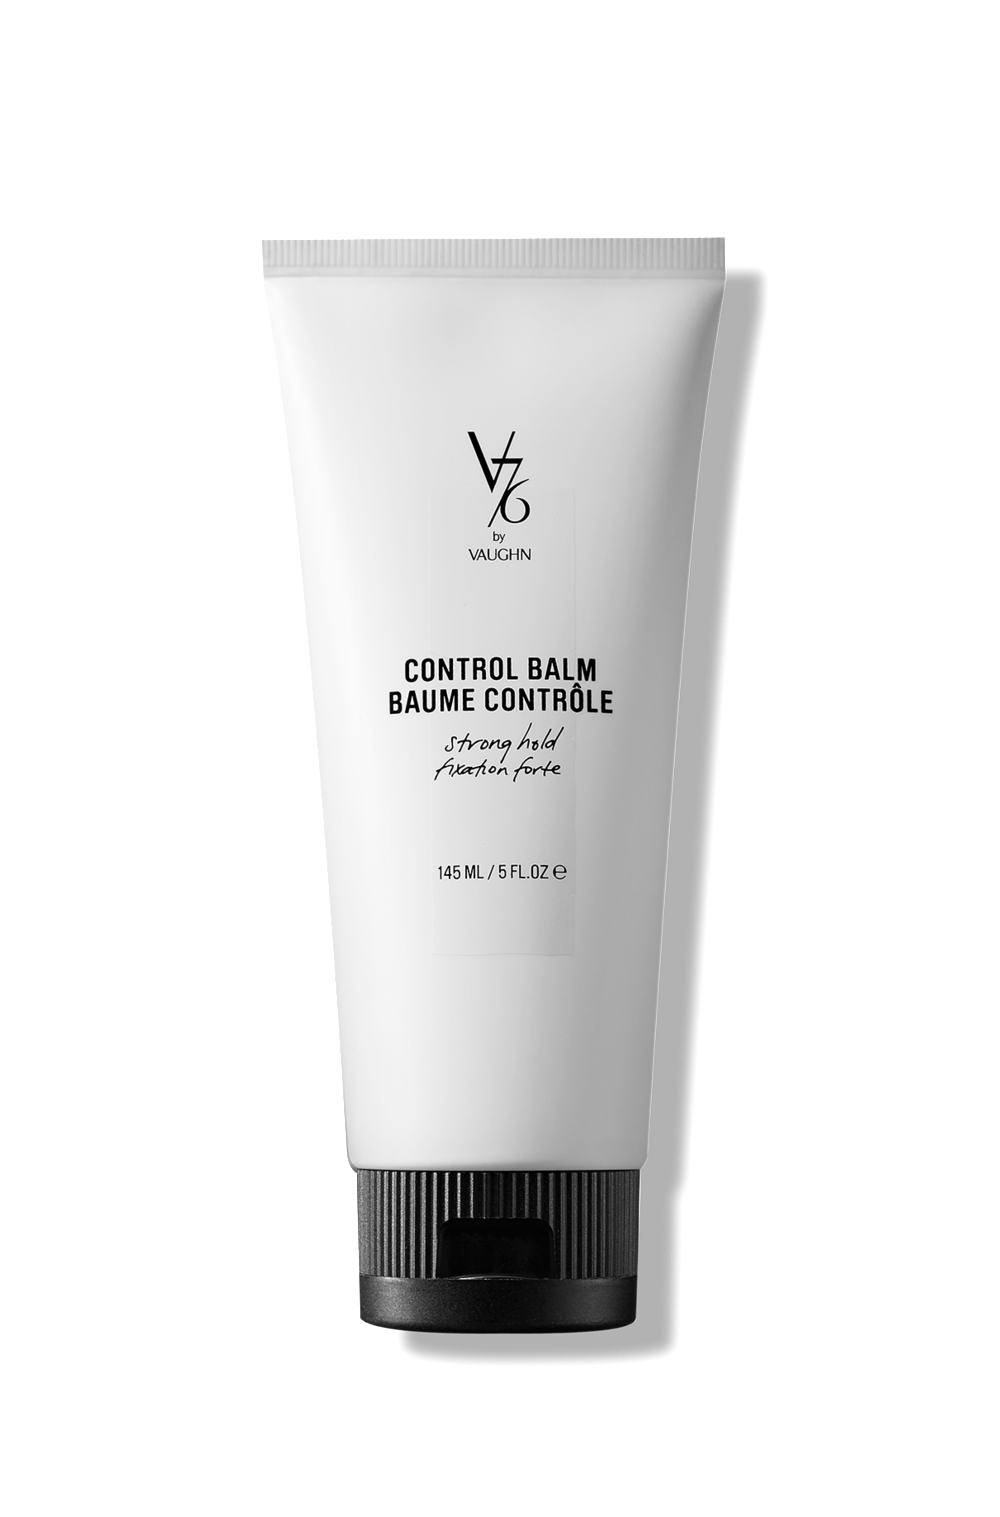 V76 by Vaughn  Control Balm, 5 oz. $20.00